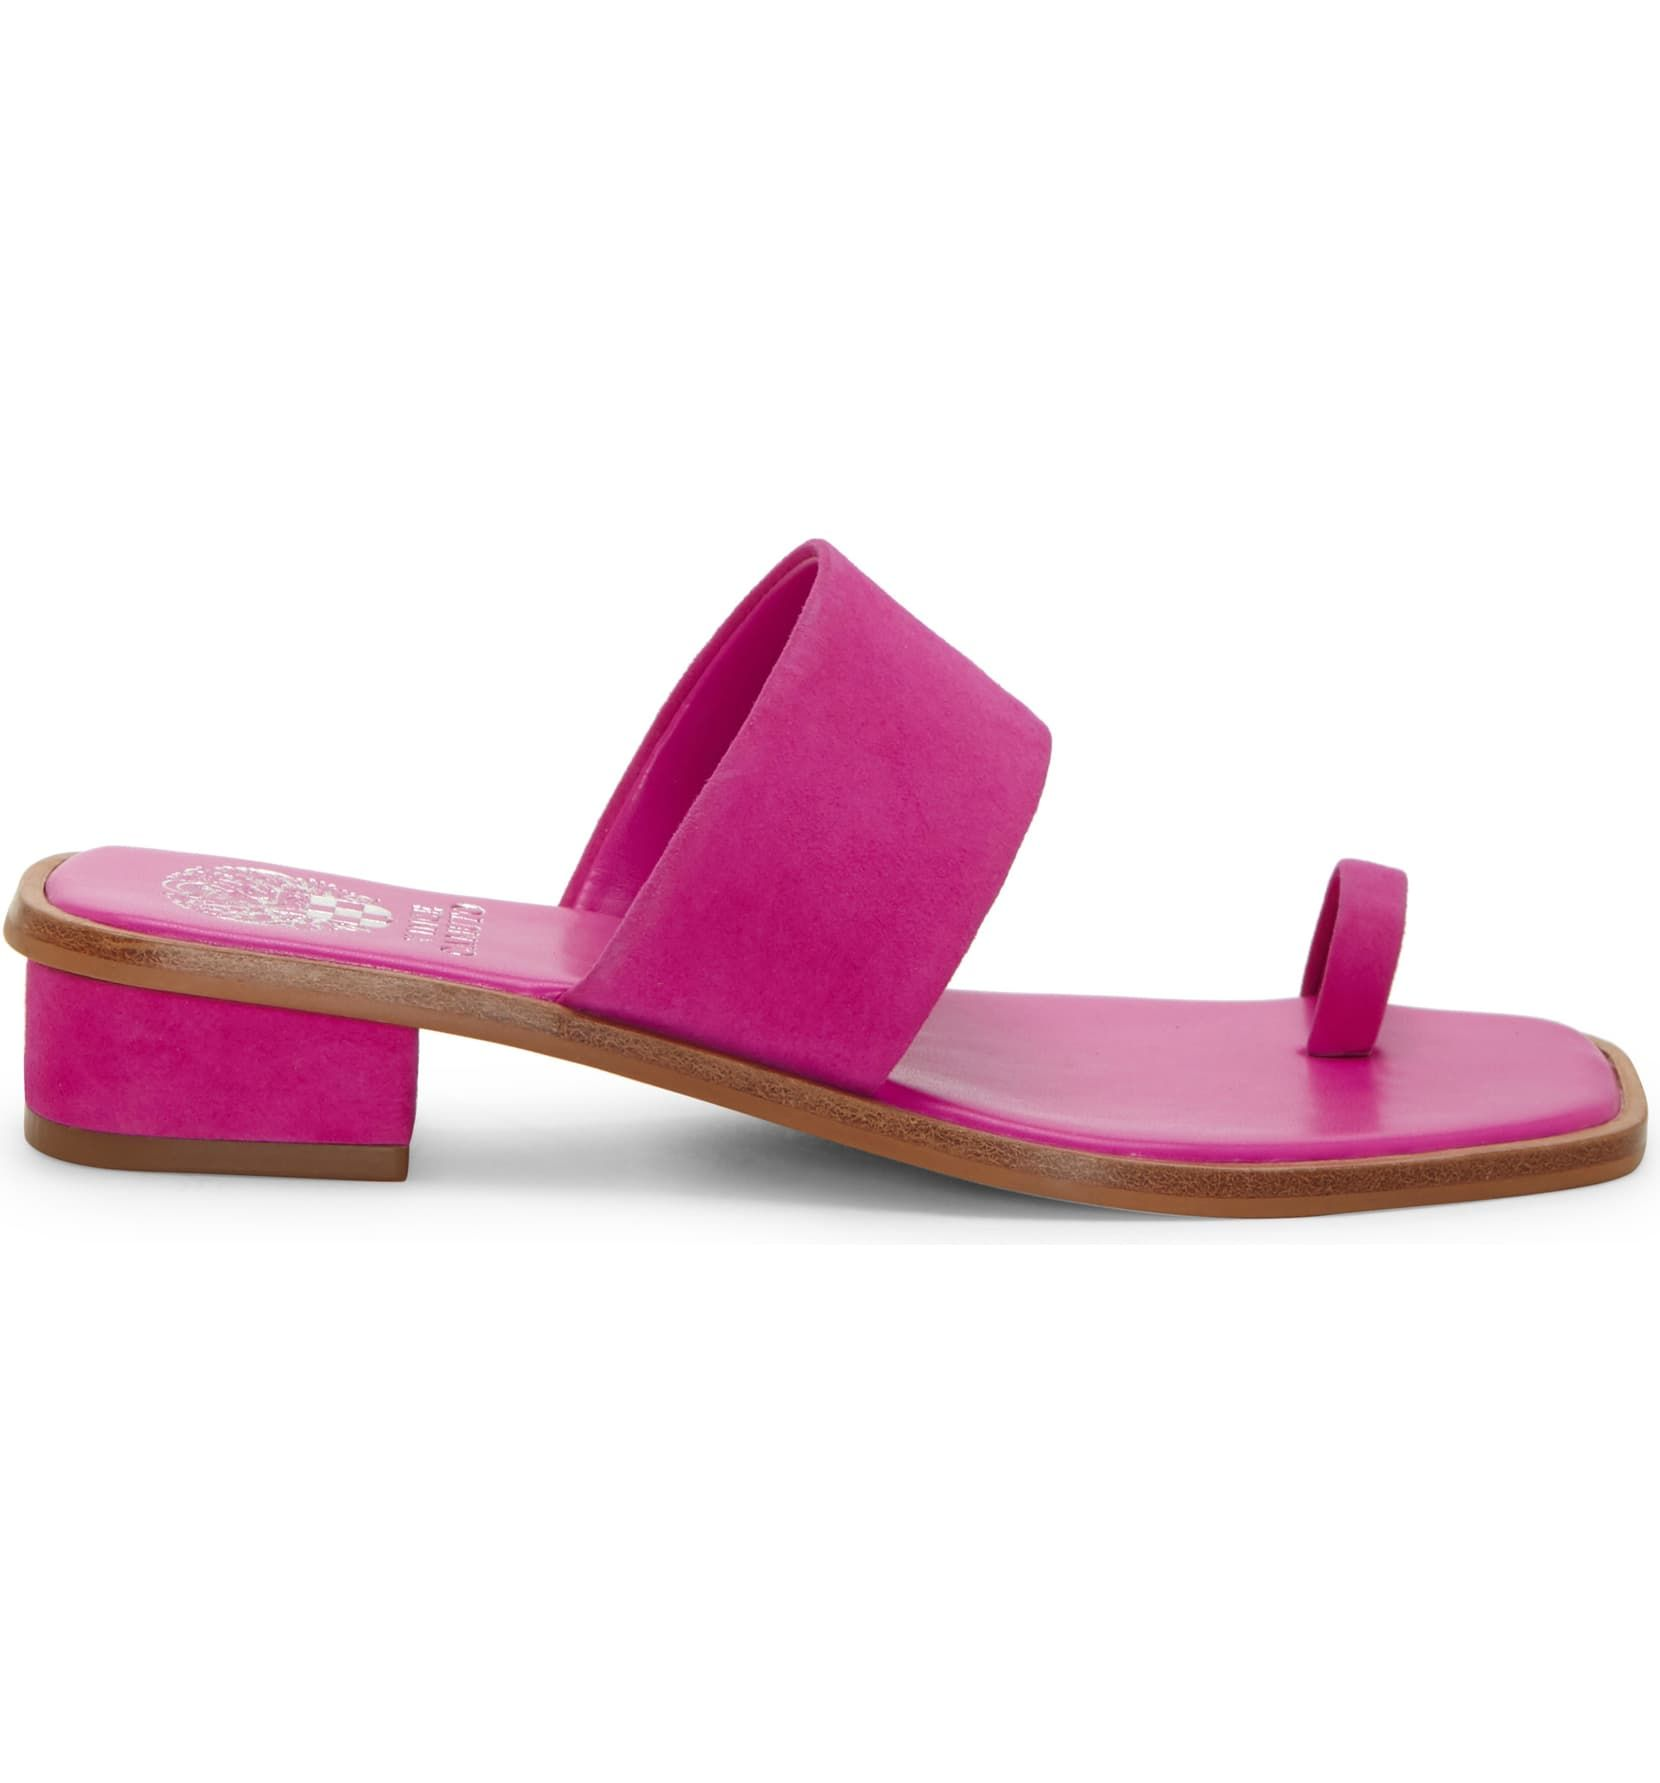 Emily Ratajkowski's Shoes Are Spring's Weirdest Sandal Trend 12